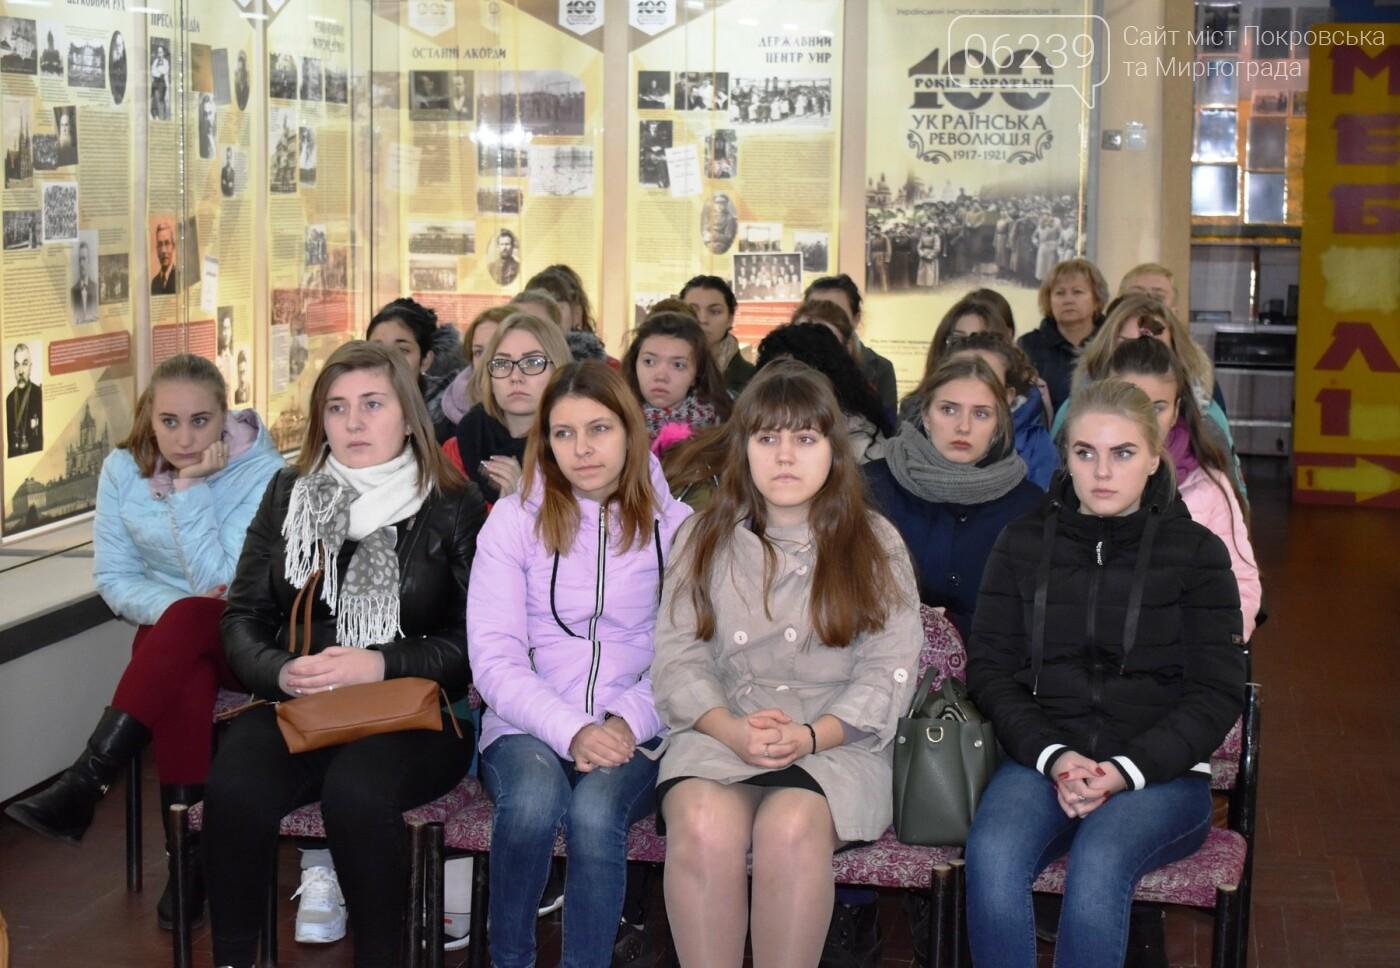 У Покровську вшанували пам'ять жертв «Великого терору», фото-1